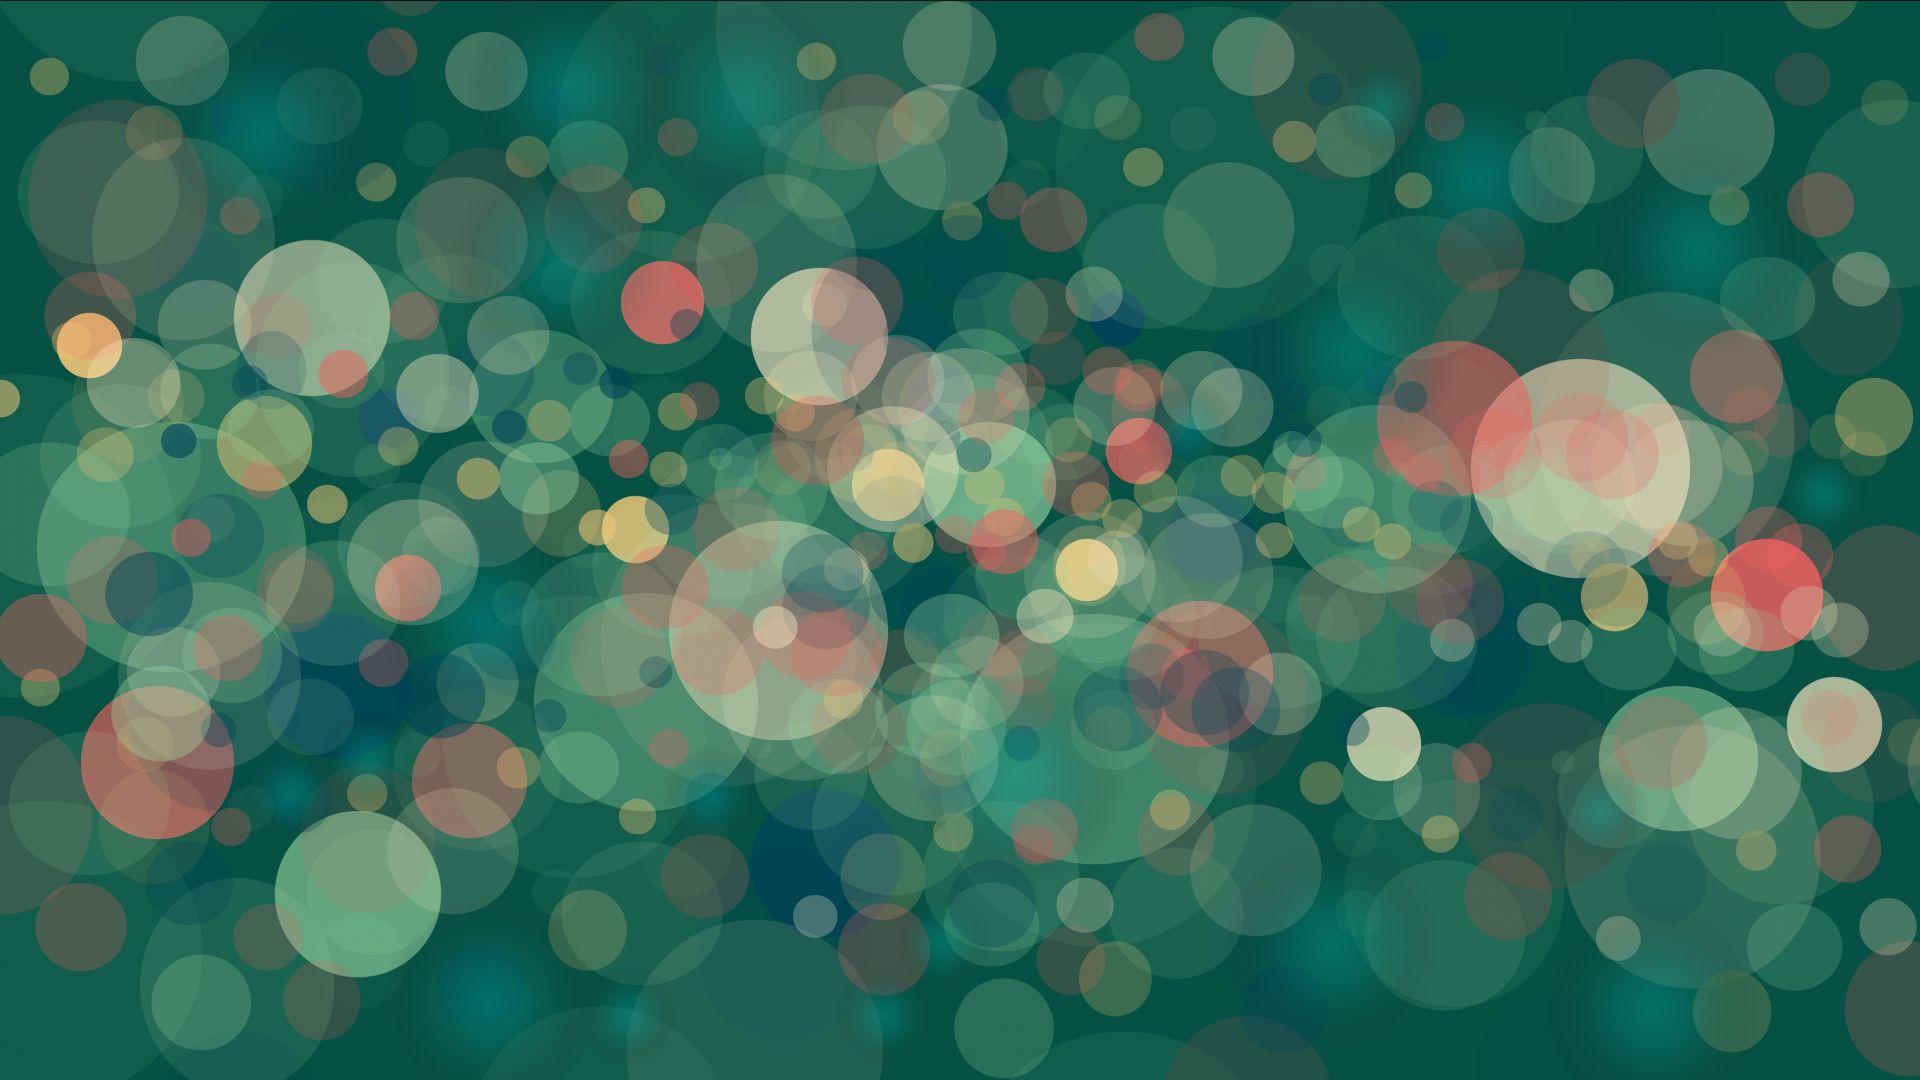 Wallpaper Bokeh, circles, abstract, green background